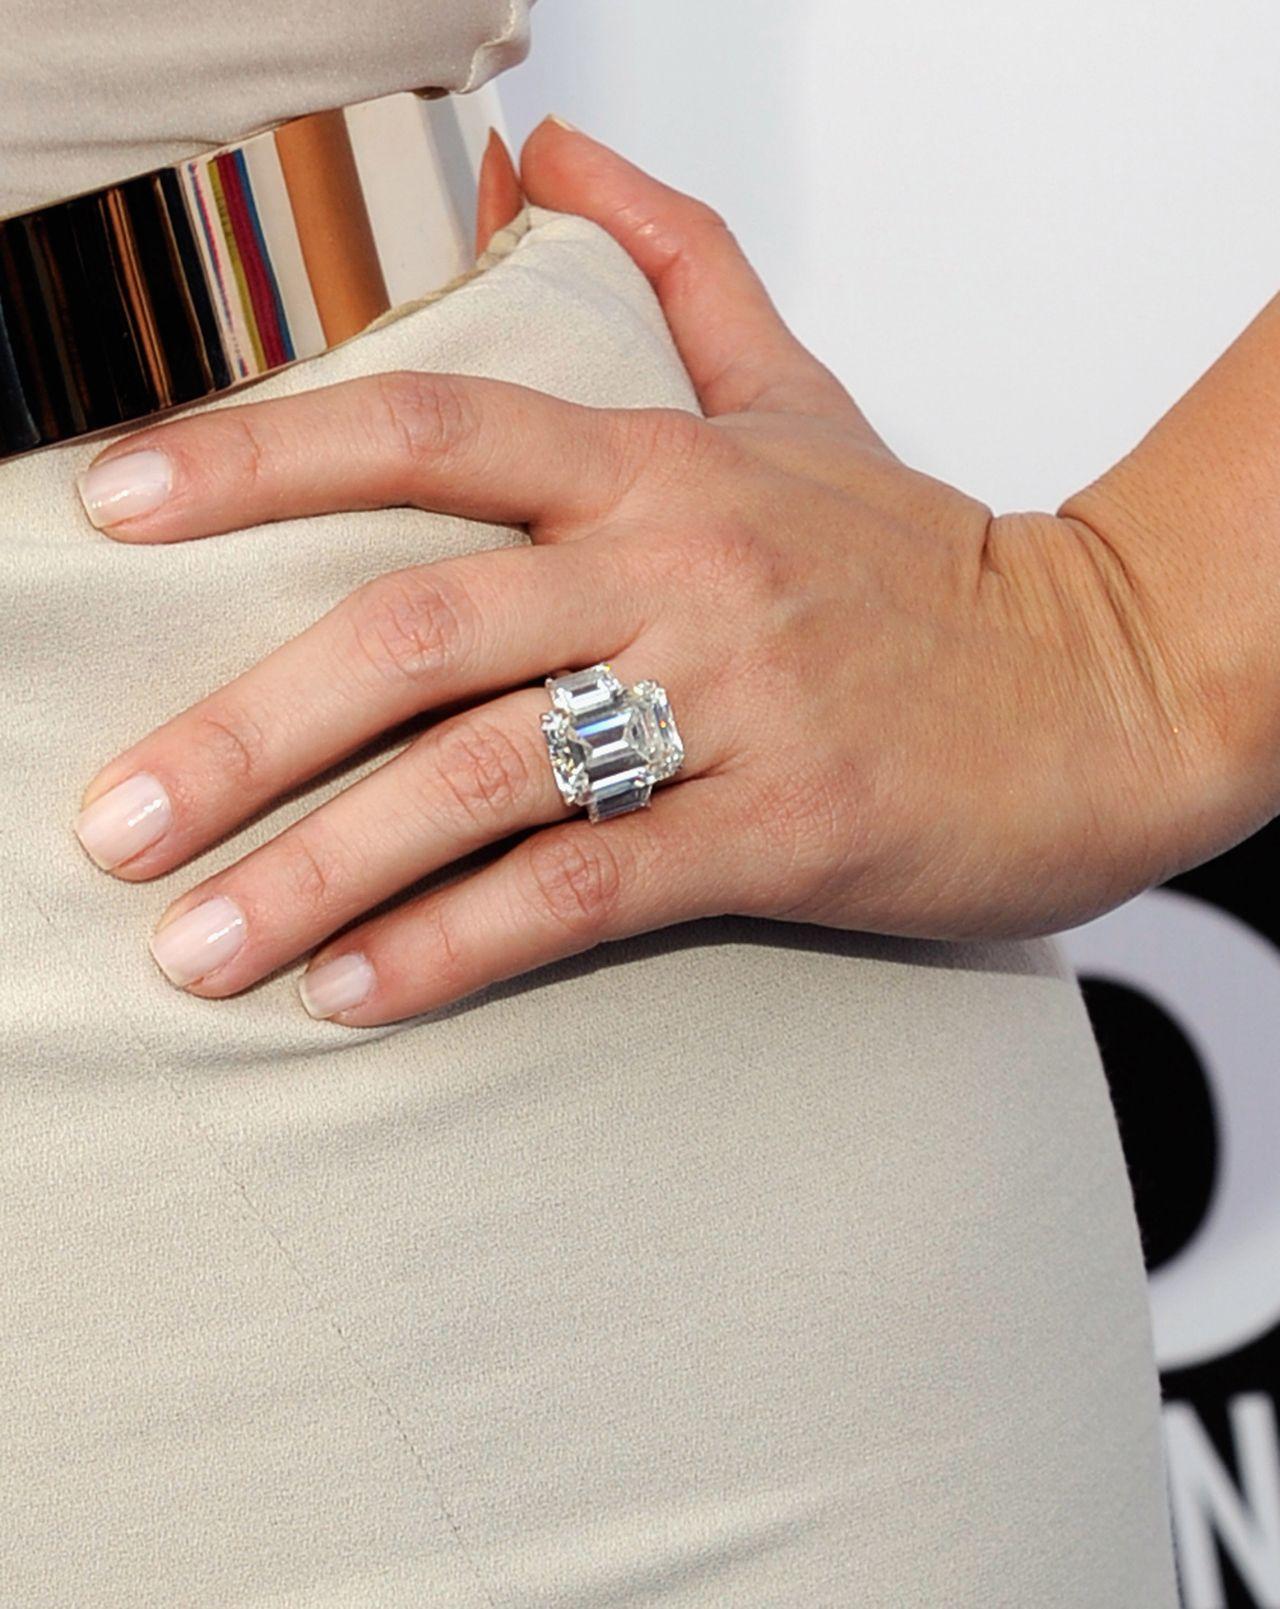 Melania Trump's 15 Carat Emeraldcut Ring Is Huge But Tasteful